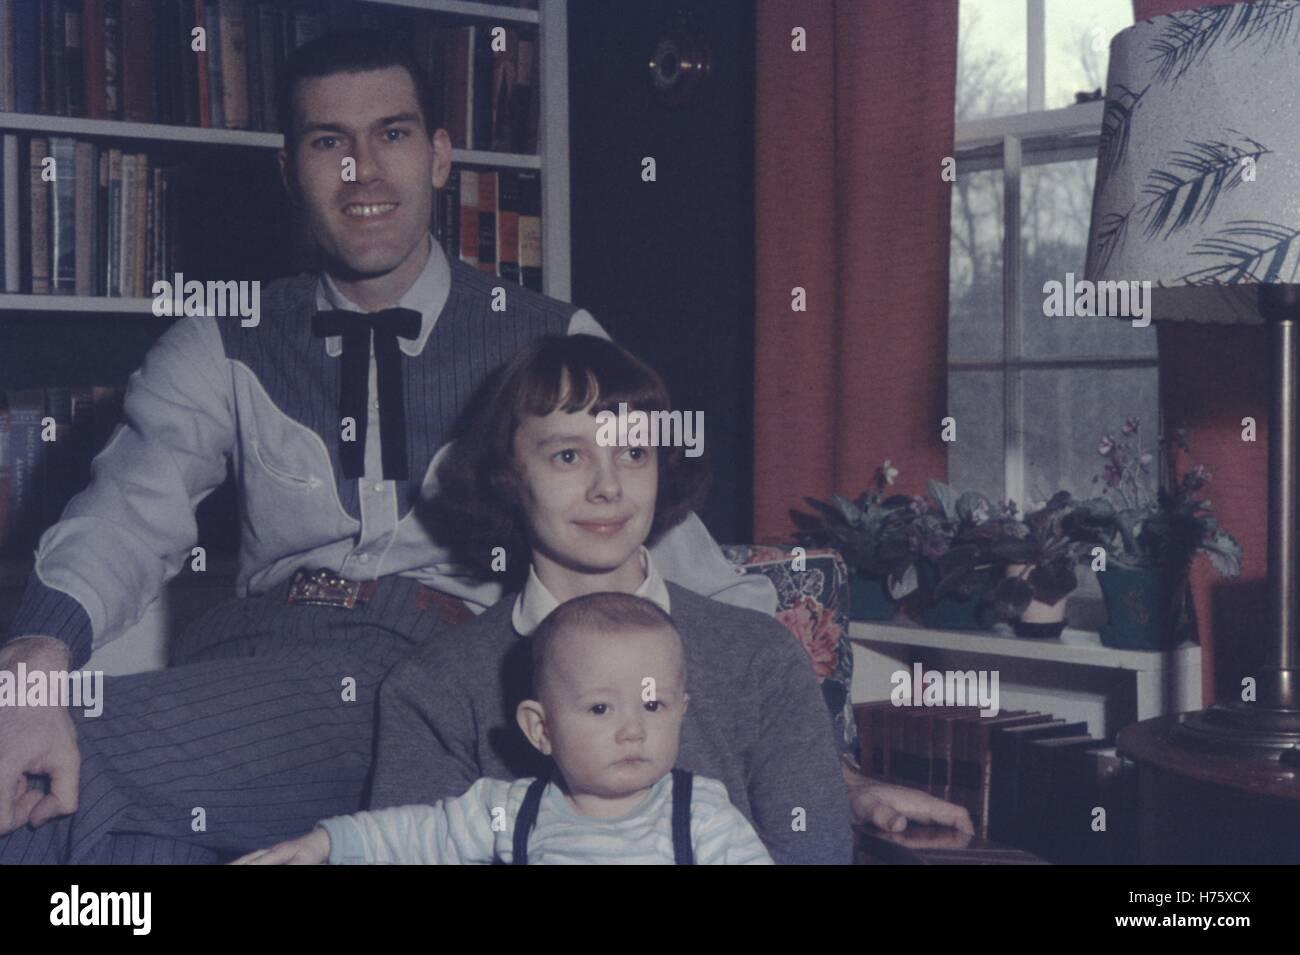 Vintage archival photograph taken in 1955 - Stock Image